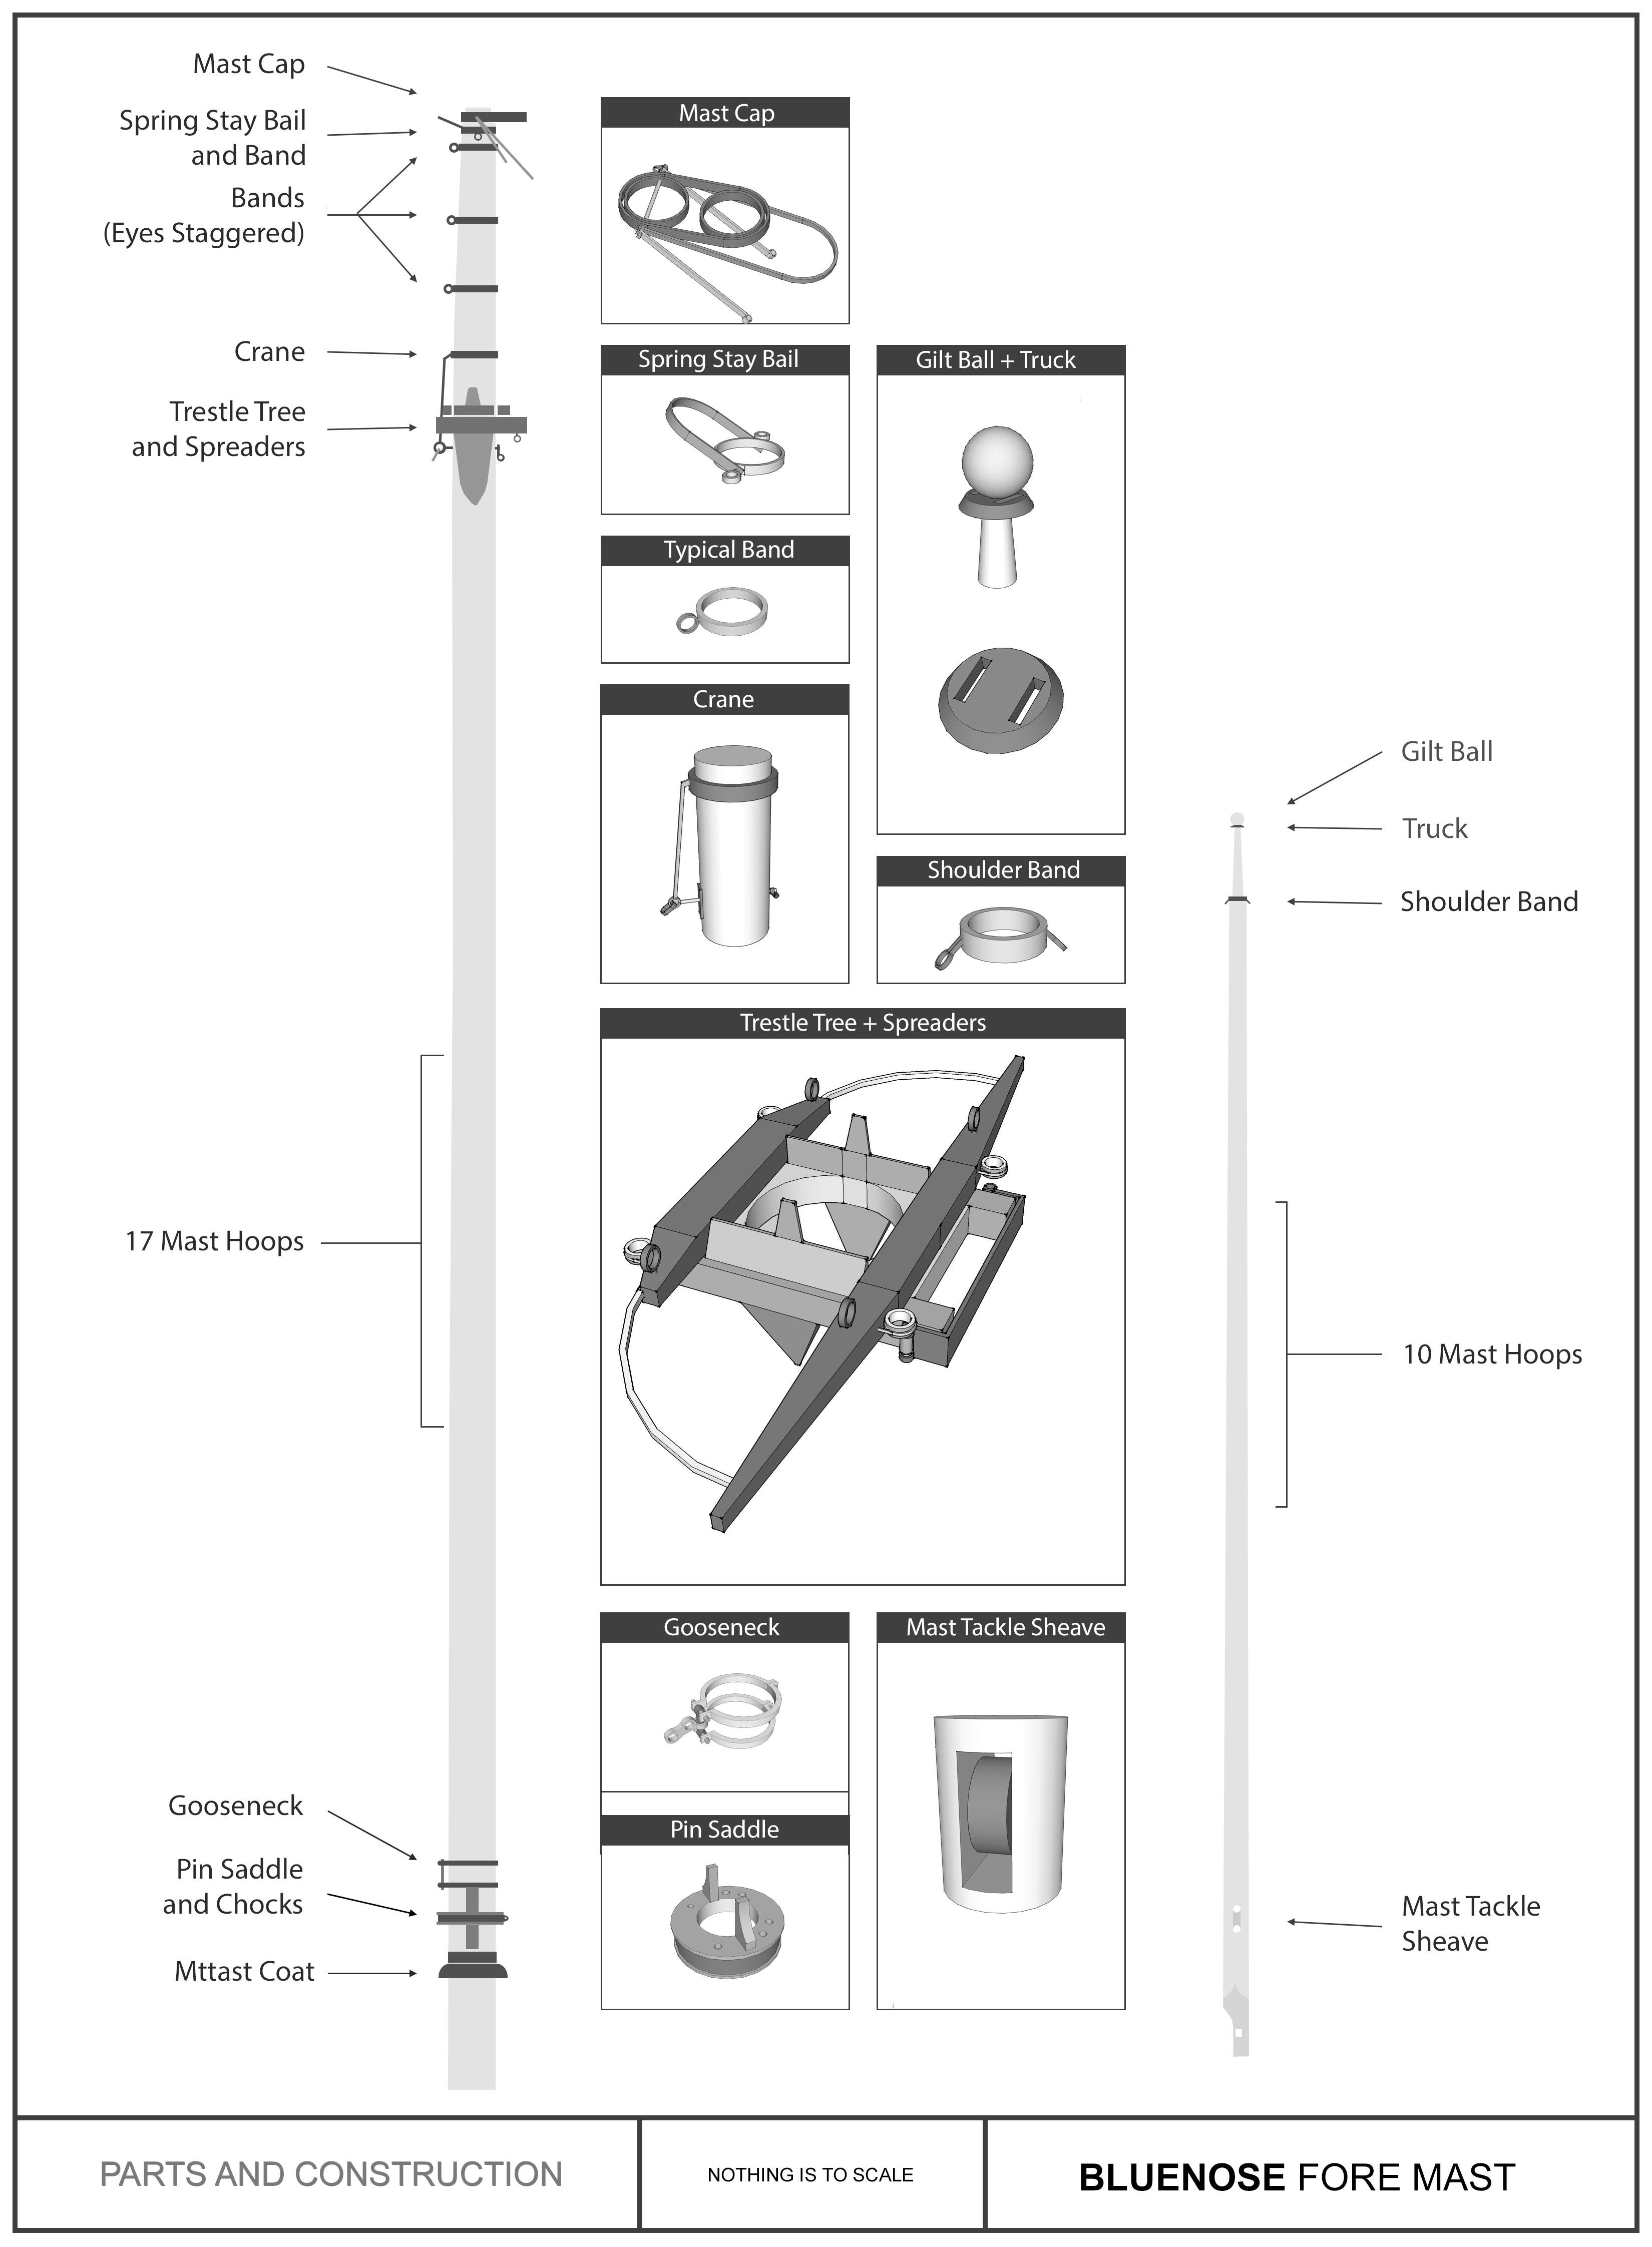 Masts---Construction